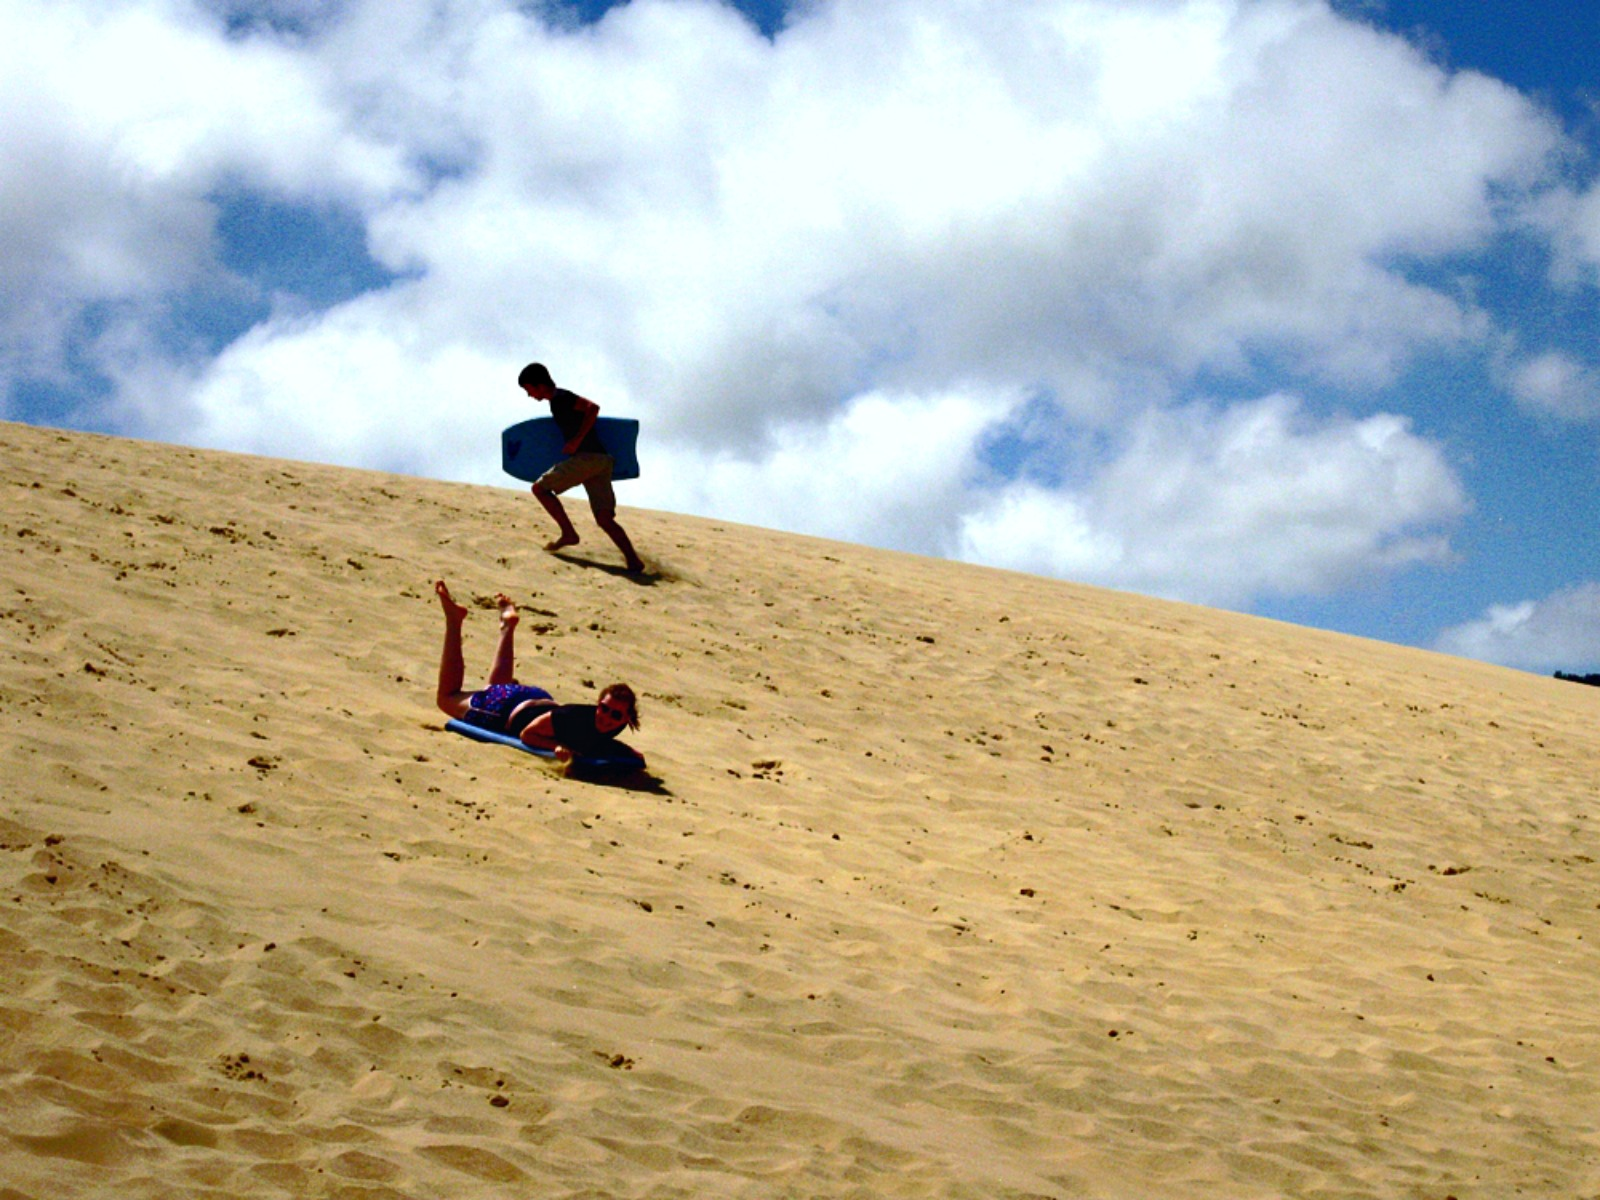 Sandboarding - Cape Reinga + 90 Mile Beach: Dune Rider Tour | www.rtwgirl.com